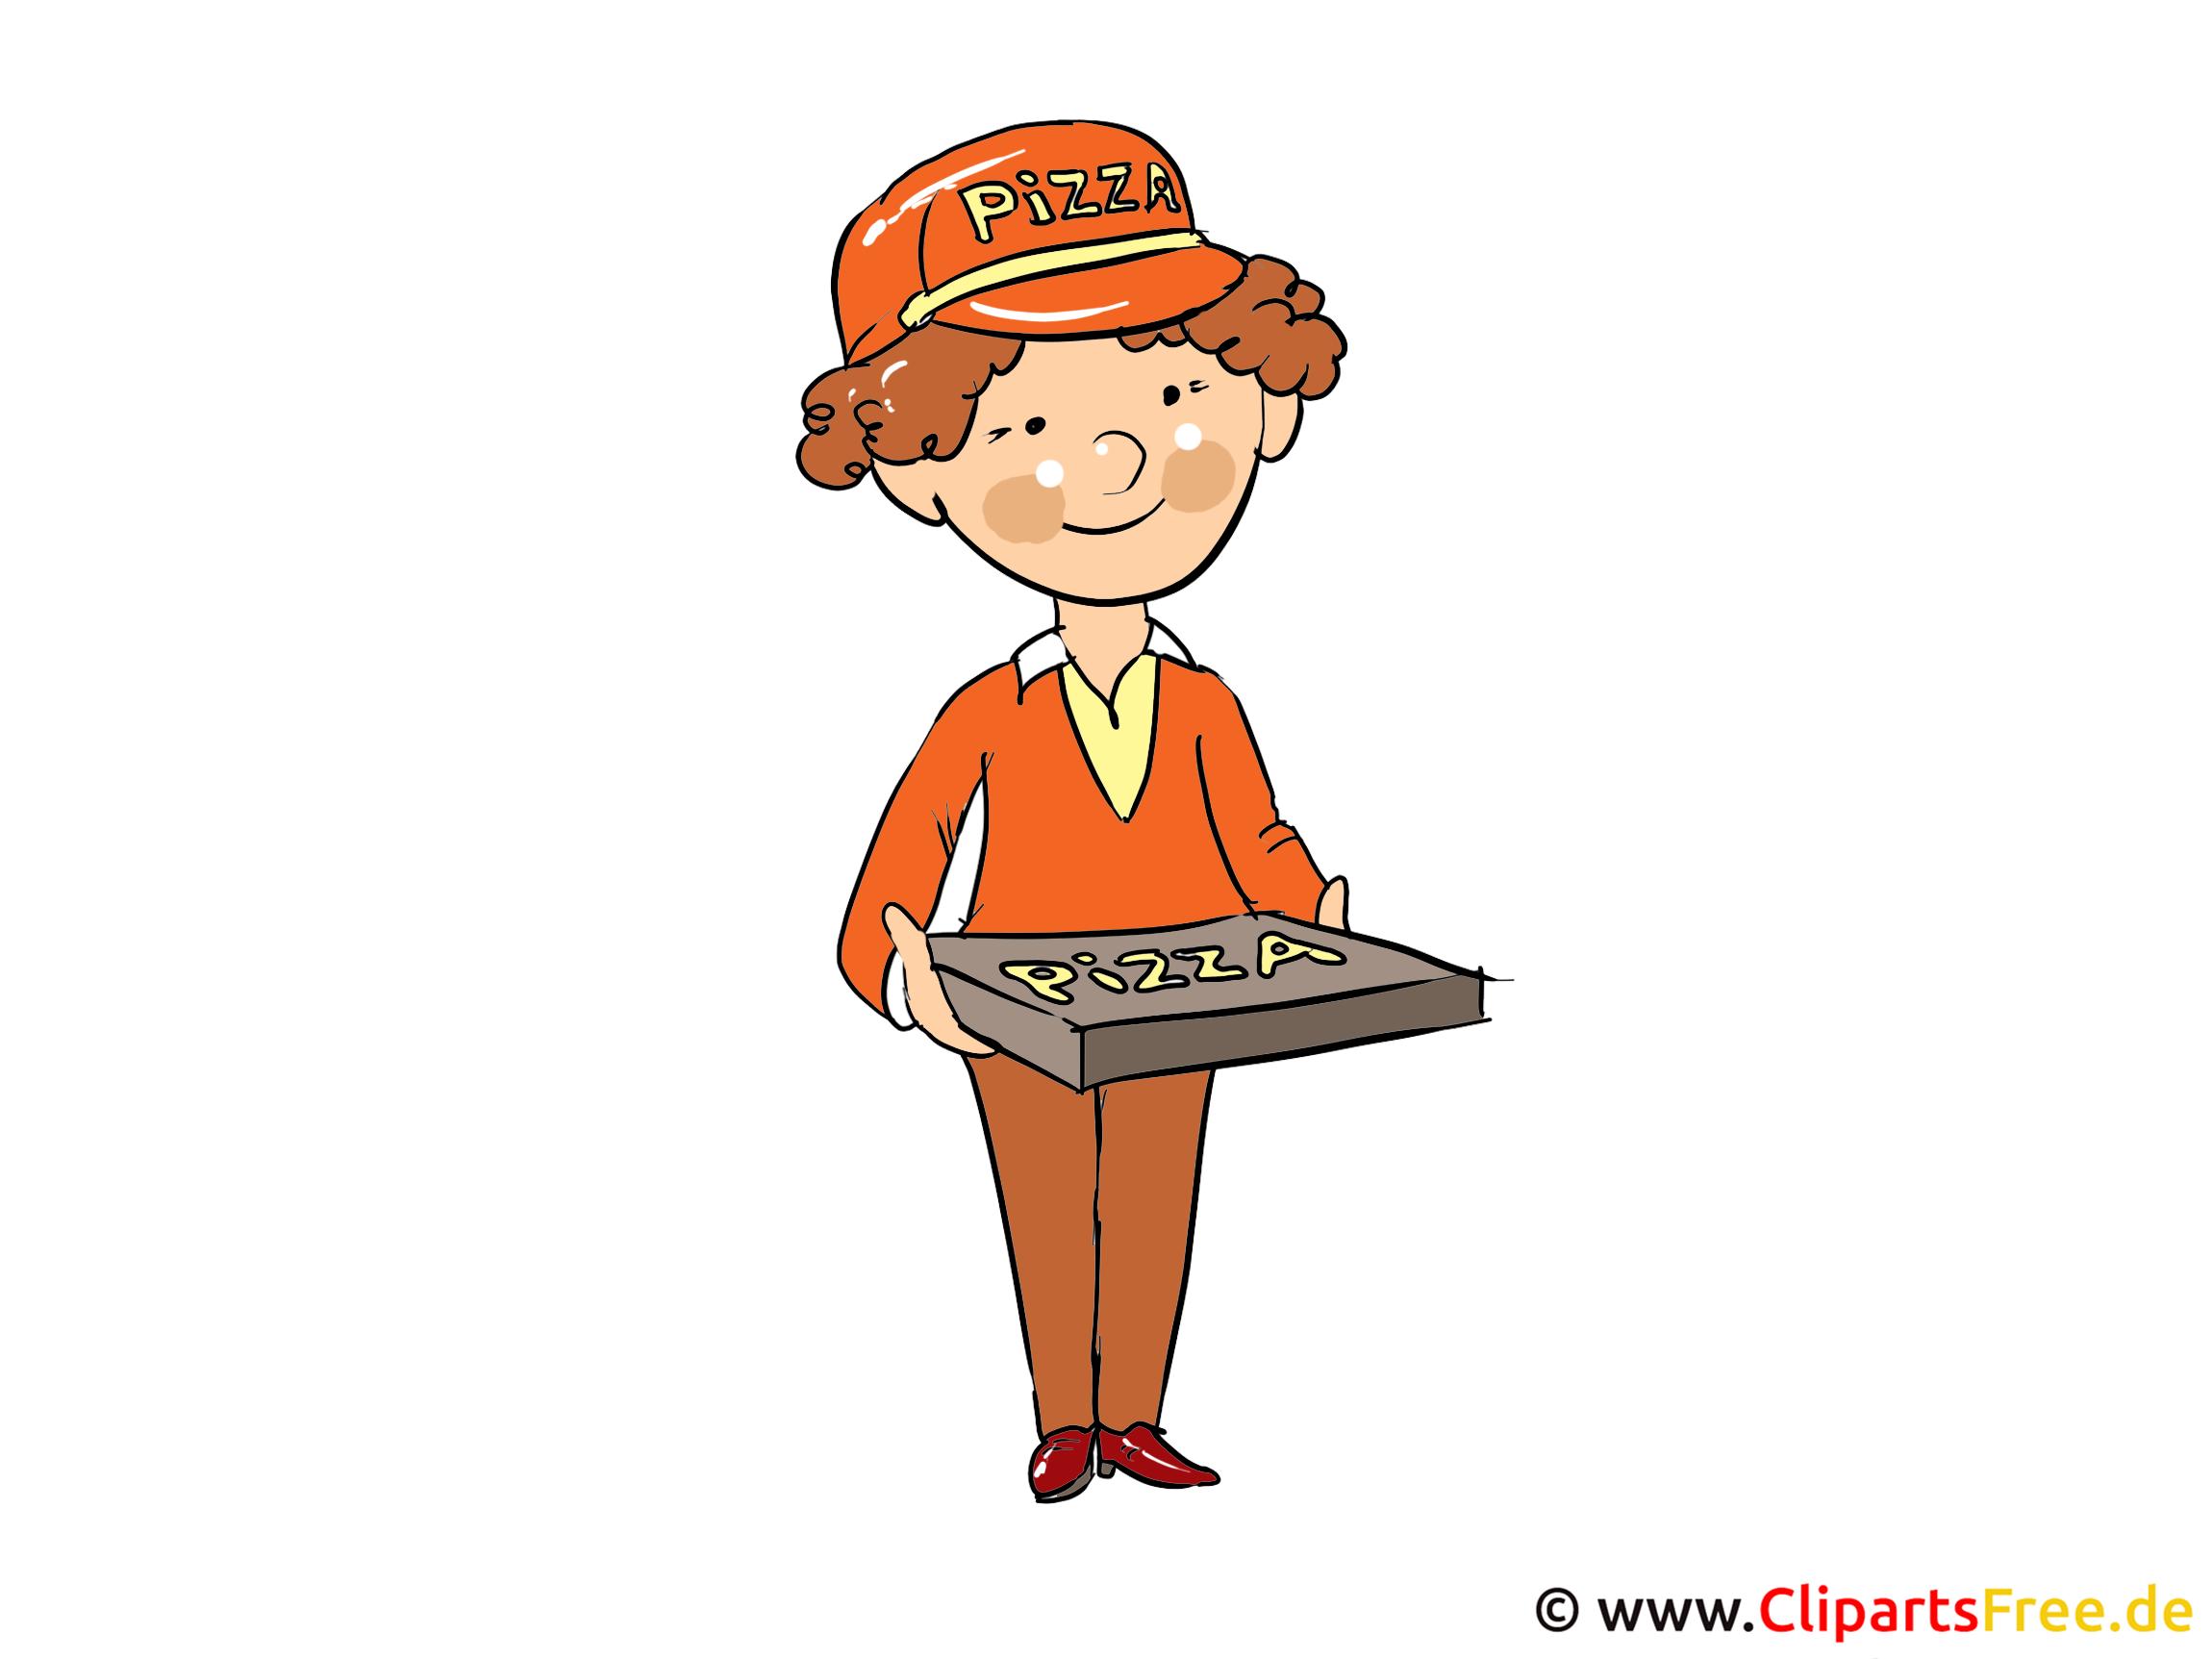 Verkauf Personal Bild, Clipart, Cartoon